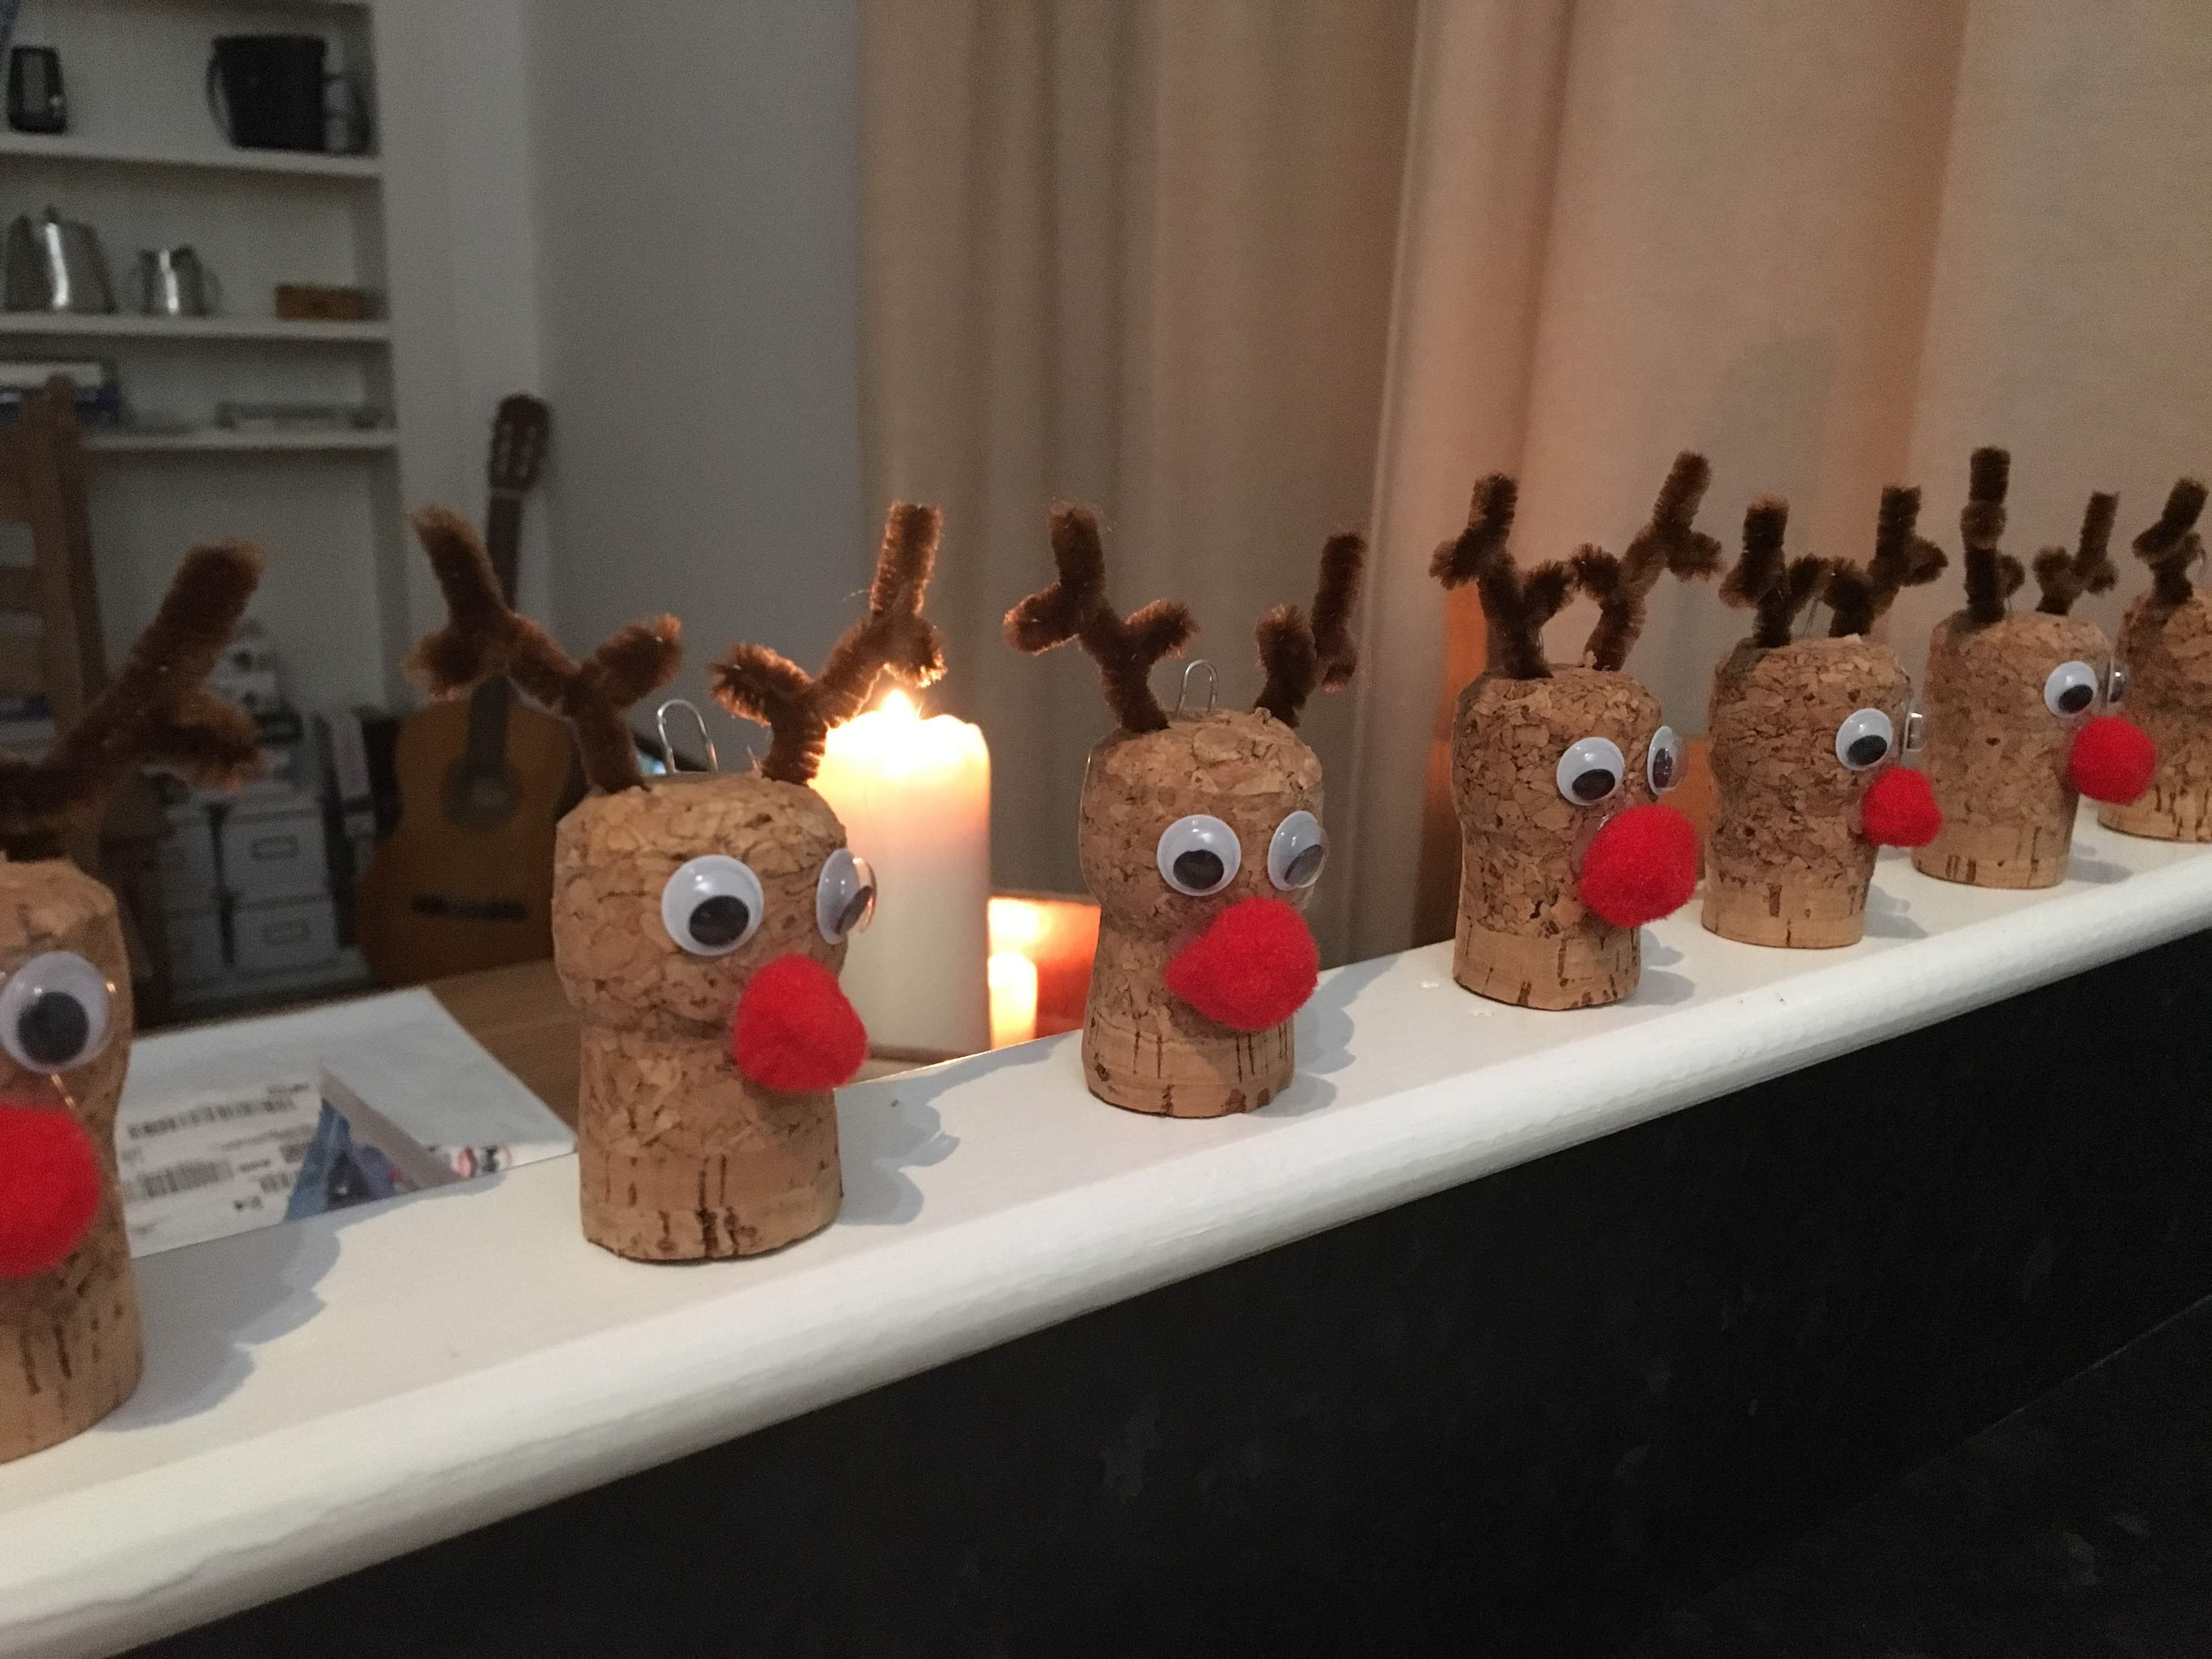 Cork Rudolph reindeers